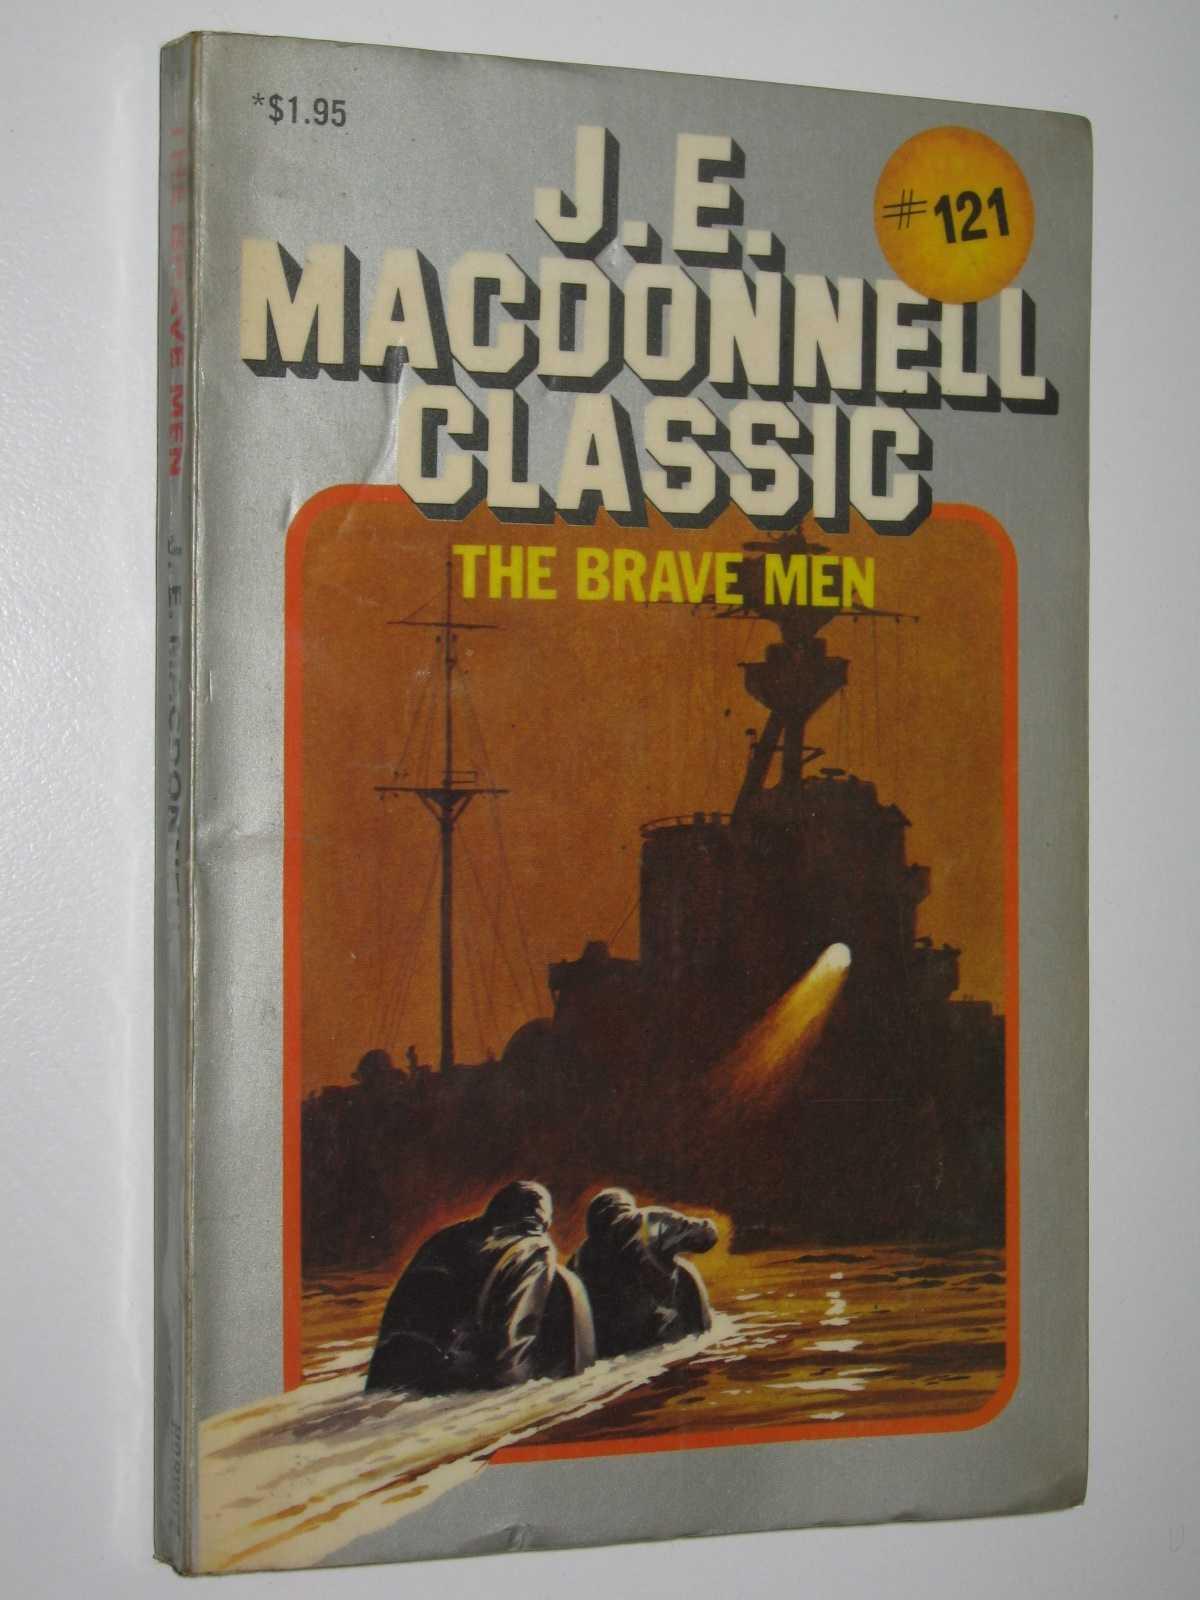 The Brave Men - Classic Series #121, Macdonnell, J. E.